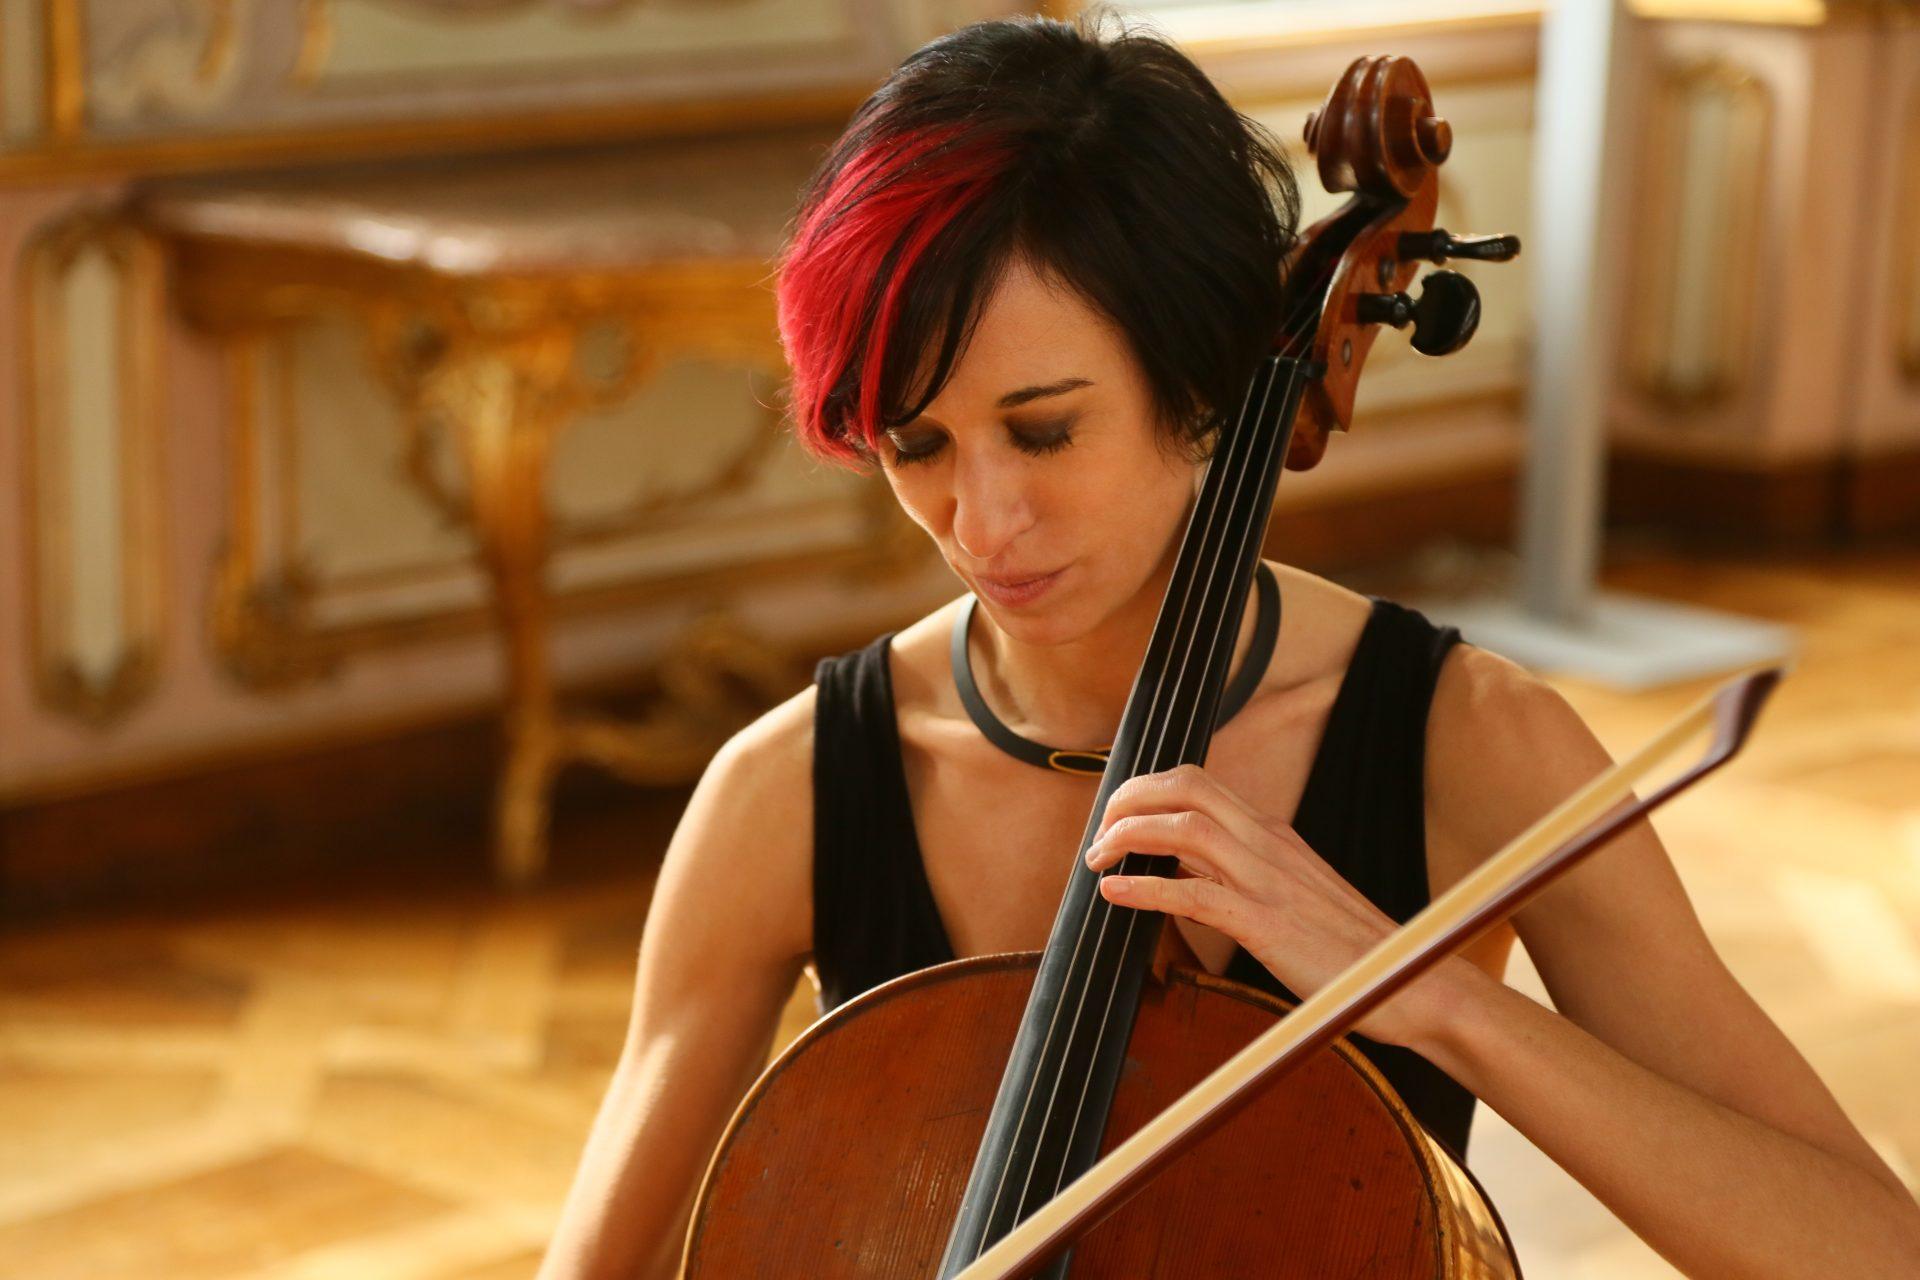 Ruth Maria Rossel ihr Cello